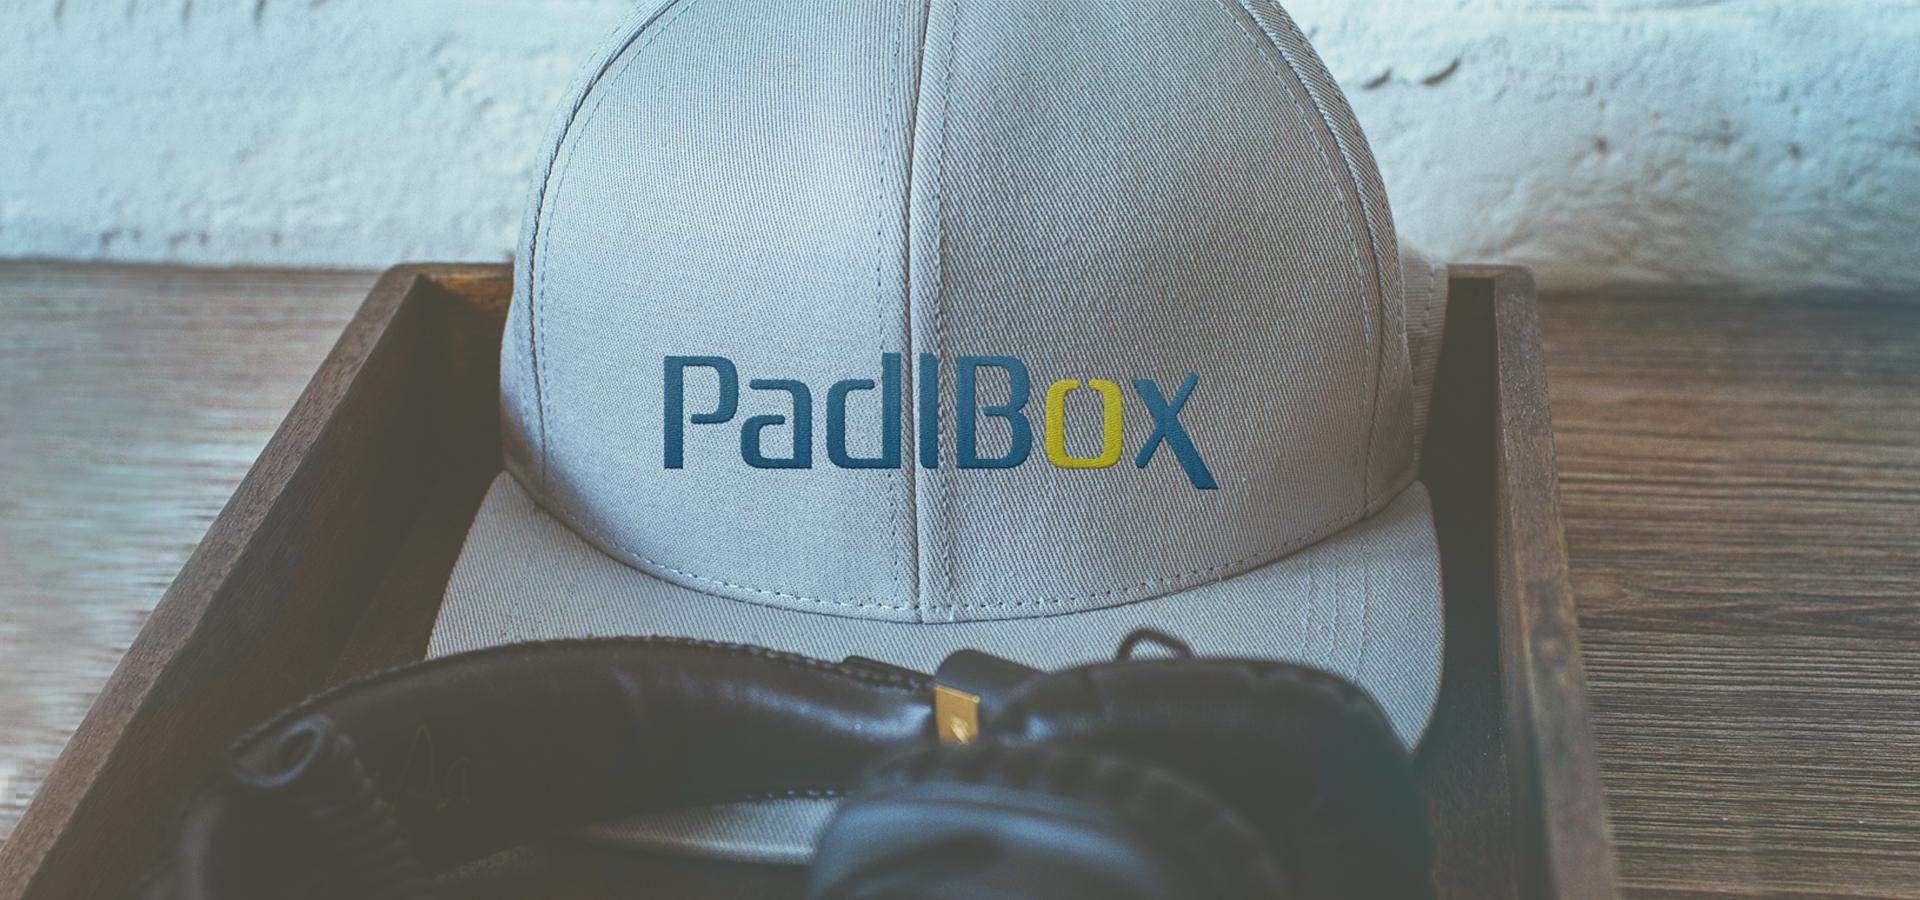 sdm_padlbox